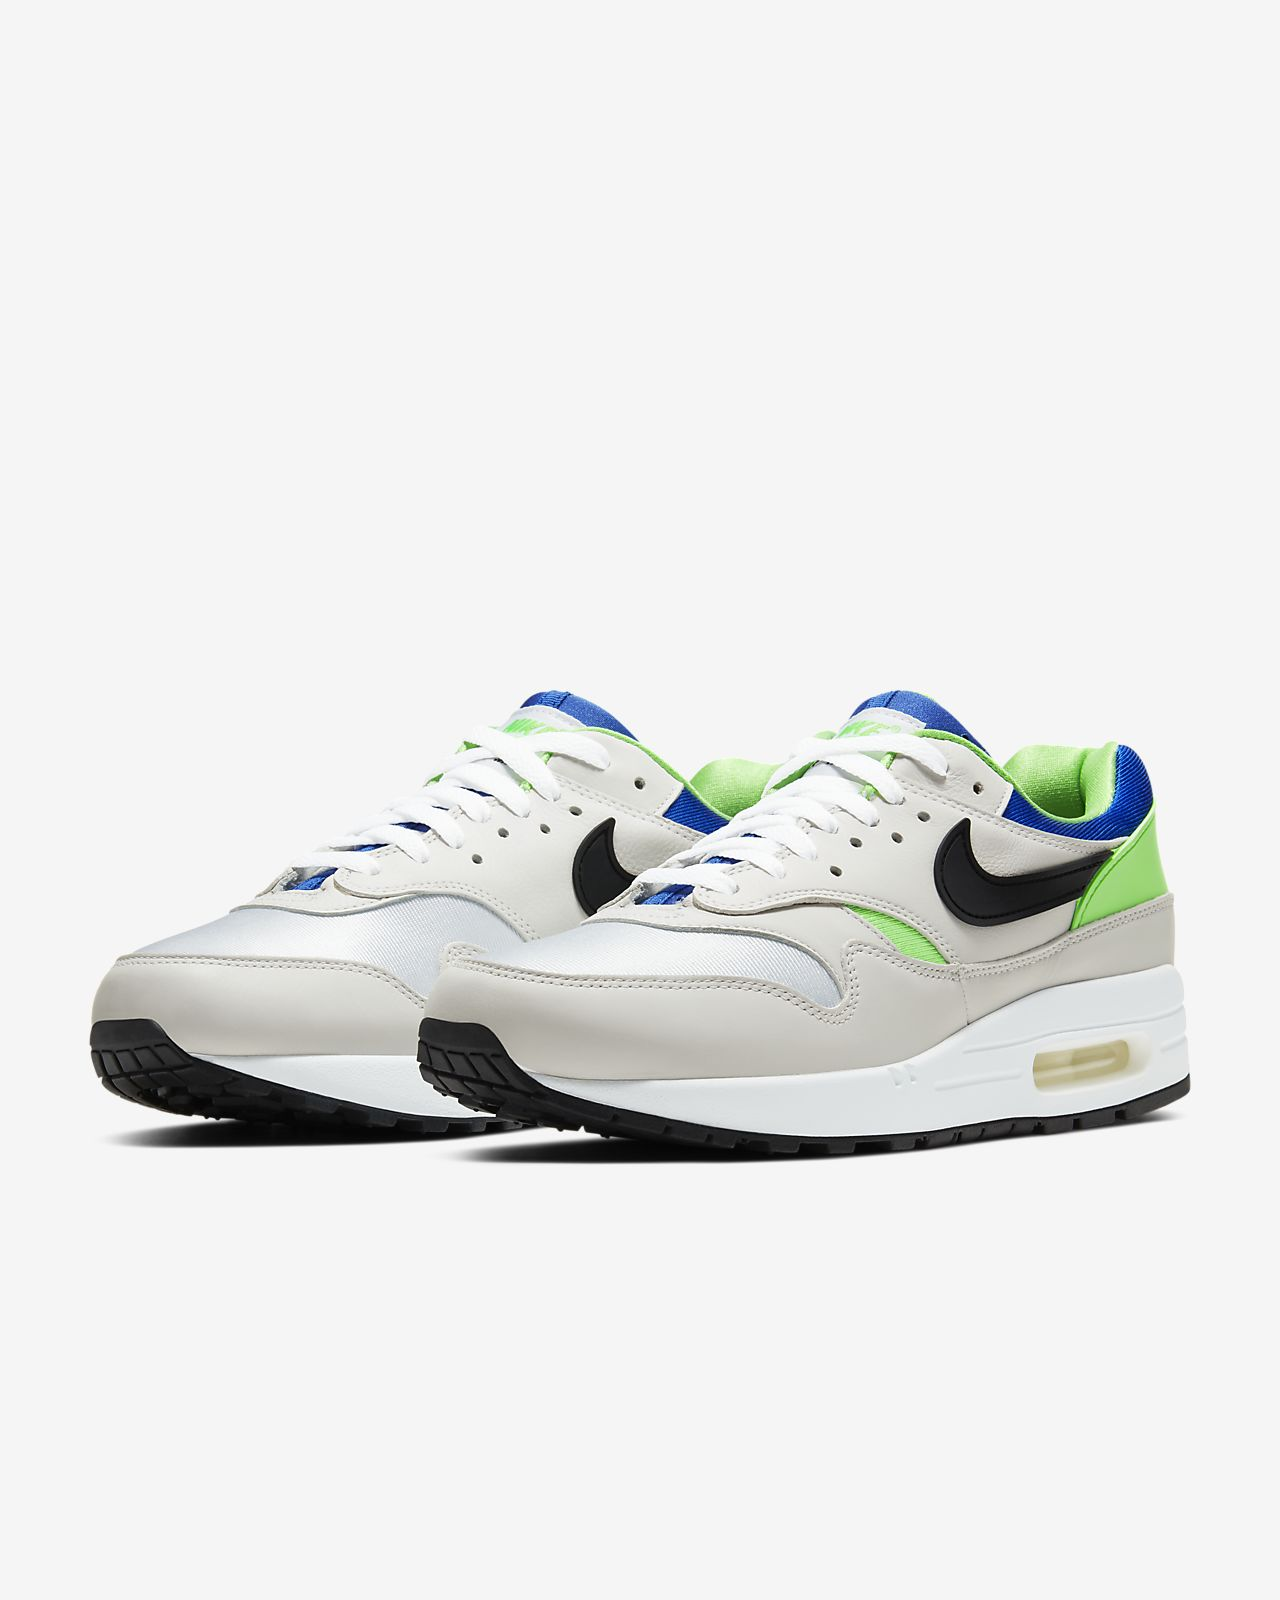 Mens Shoes Nike Air Max 1 White AH8145 109 | Pro